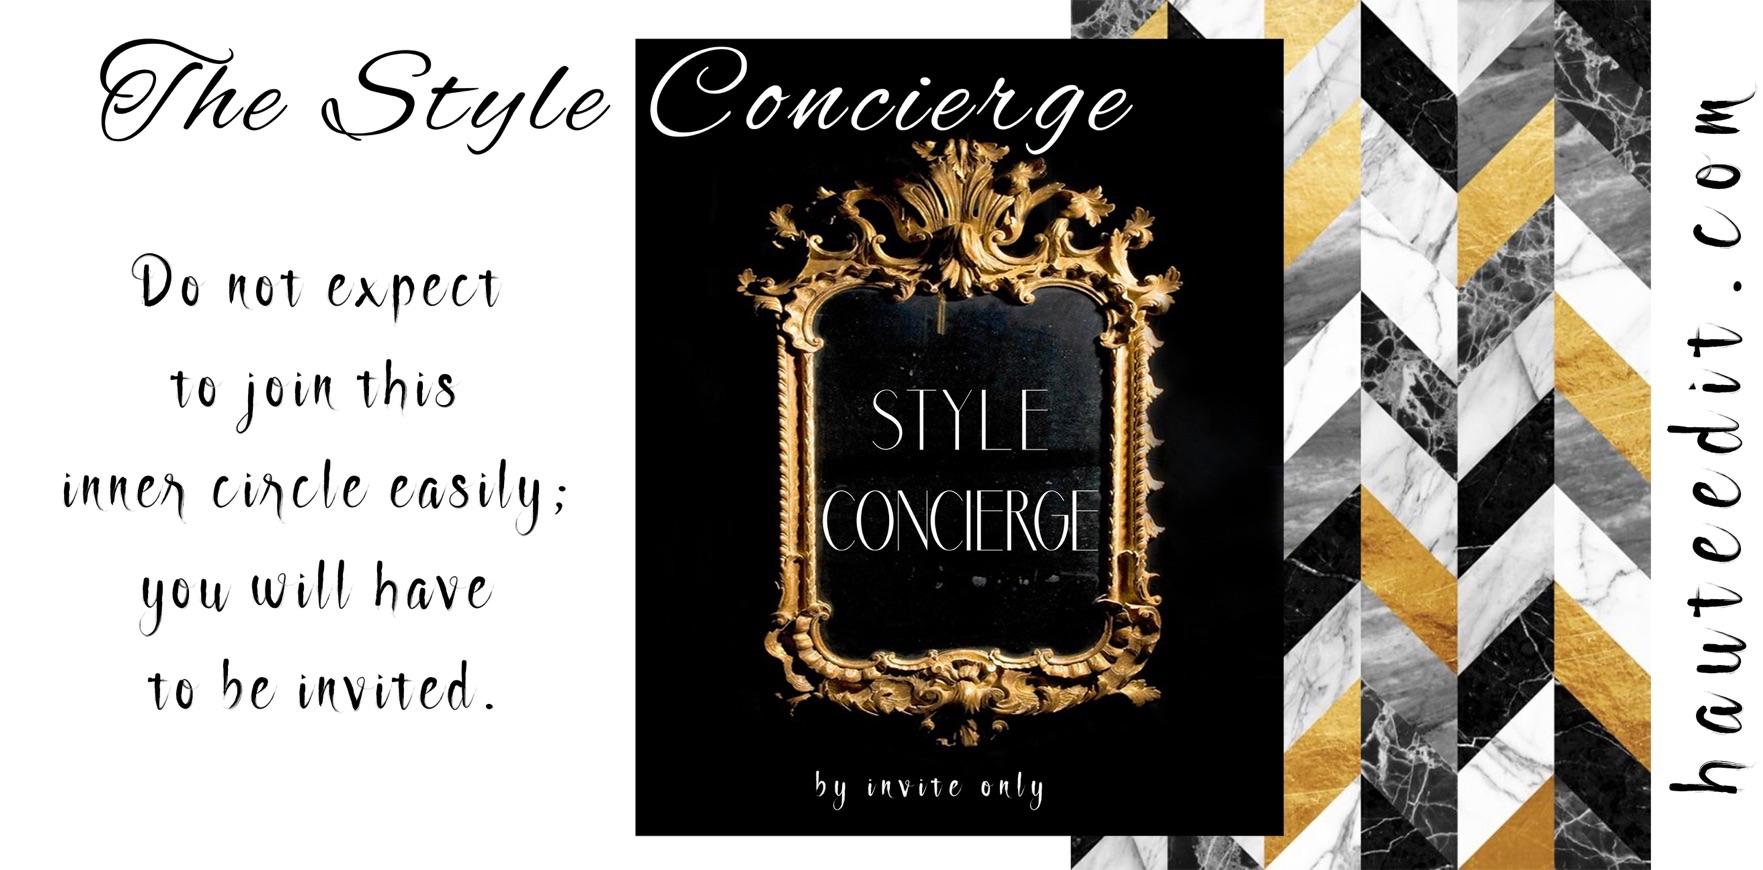 The Style Concierge